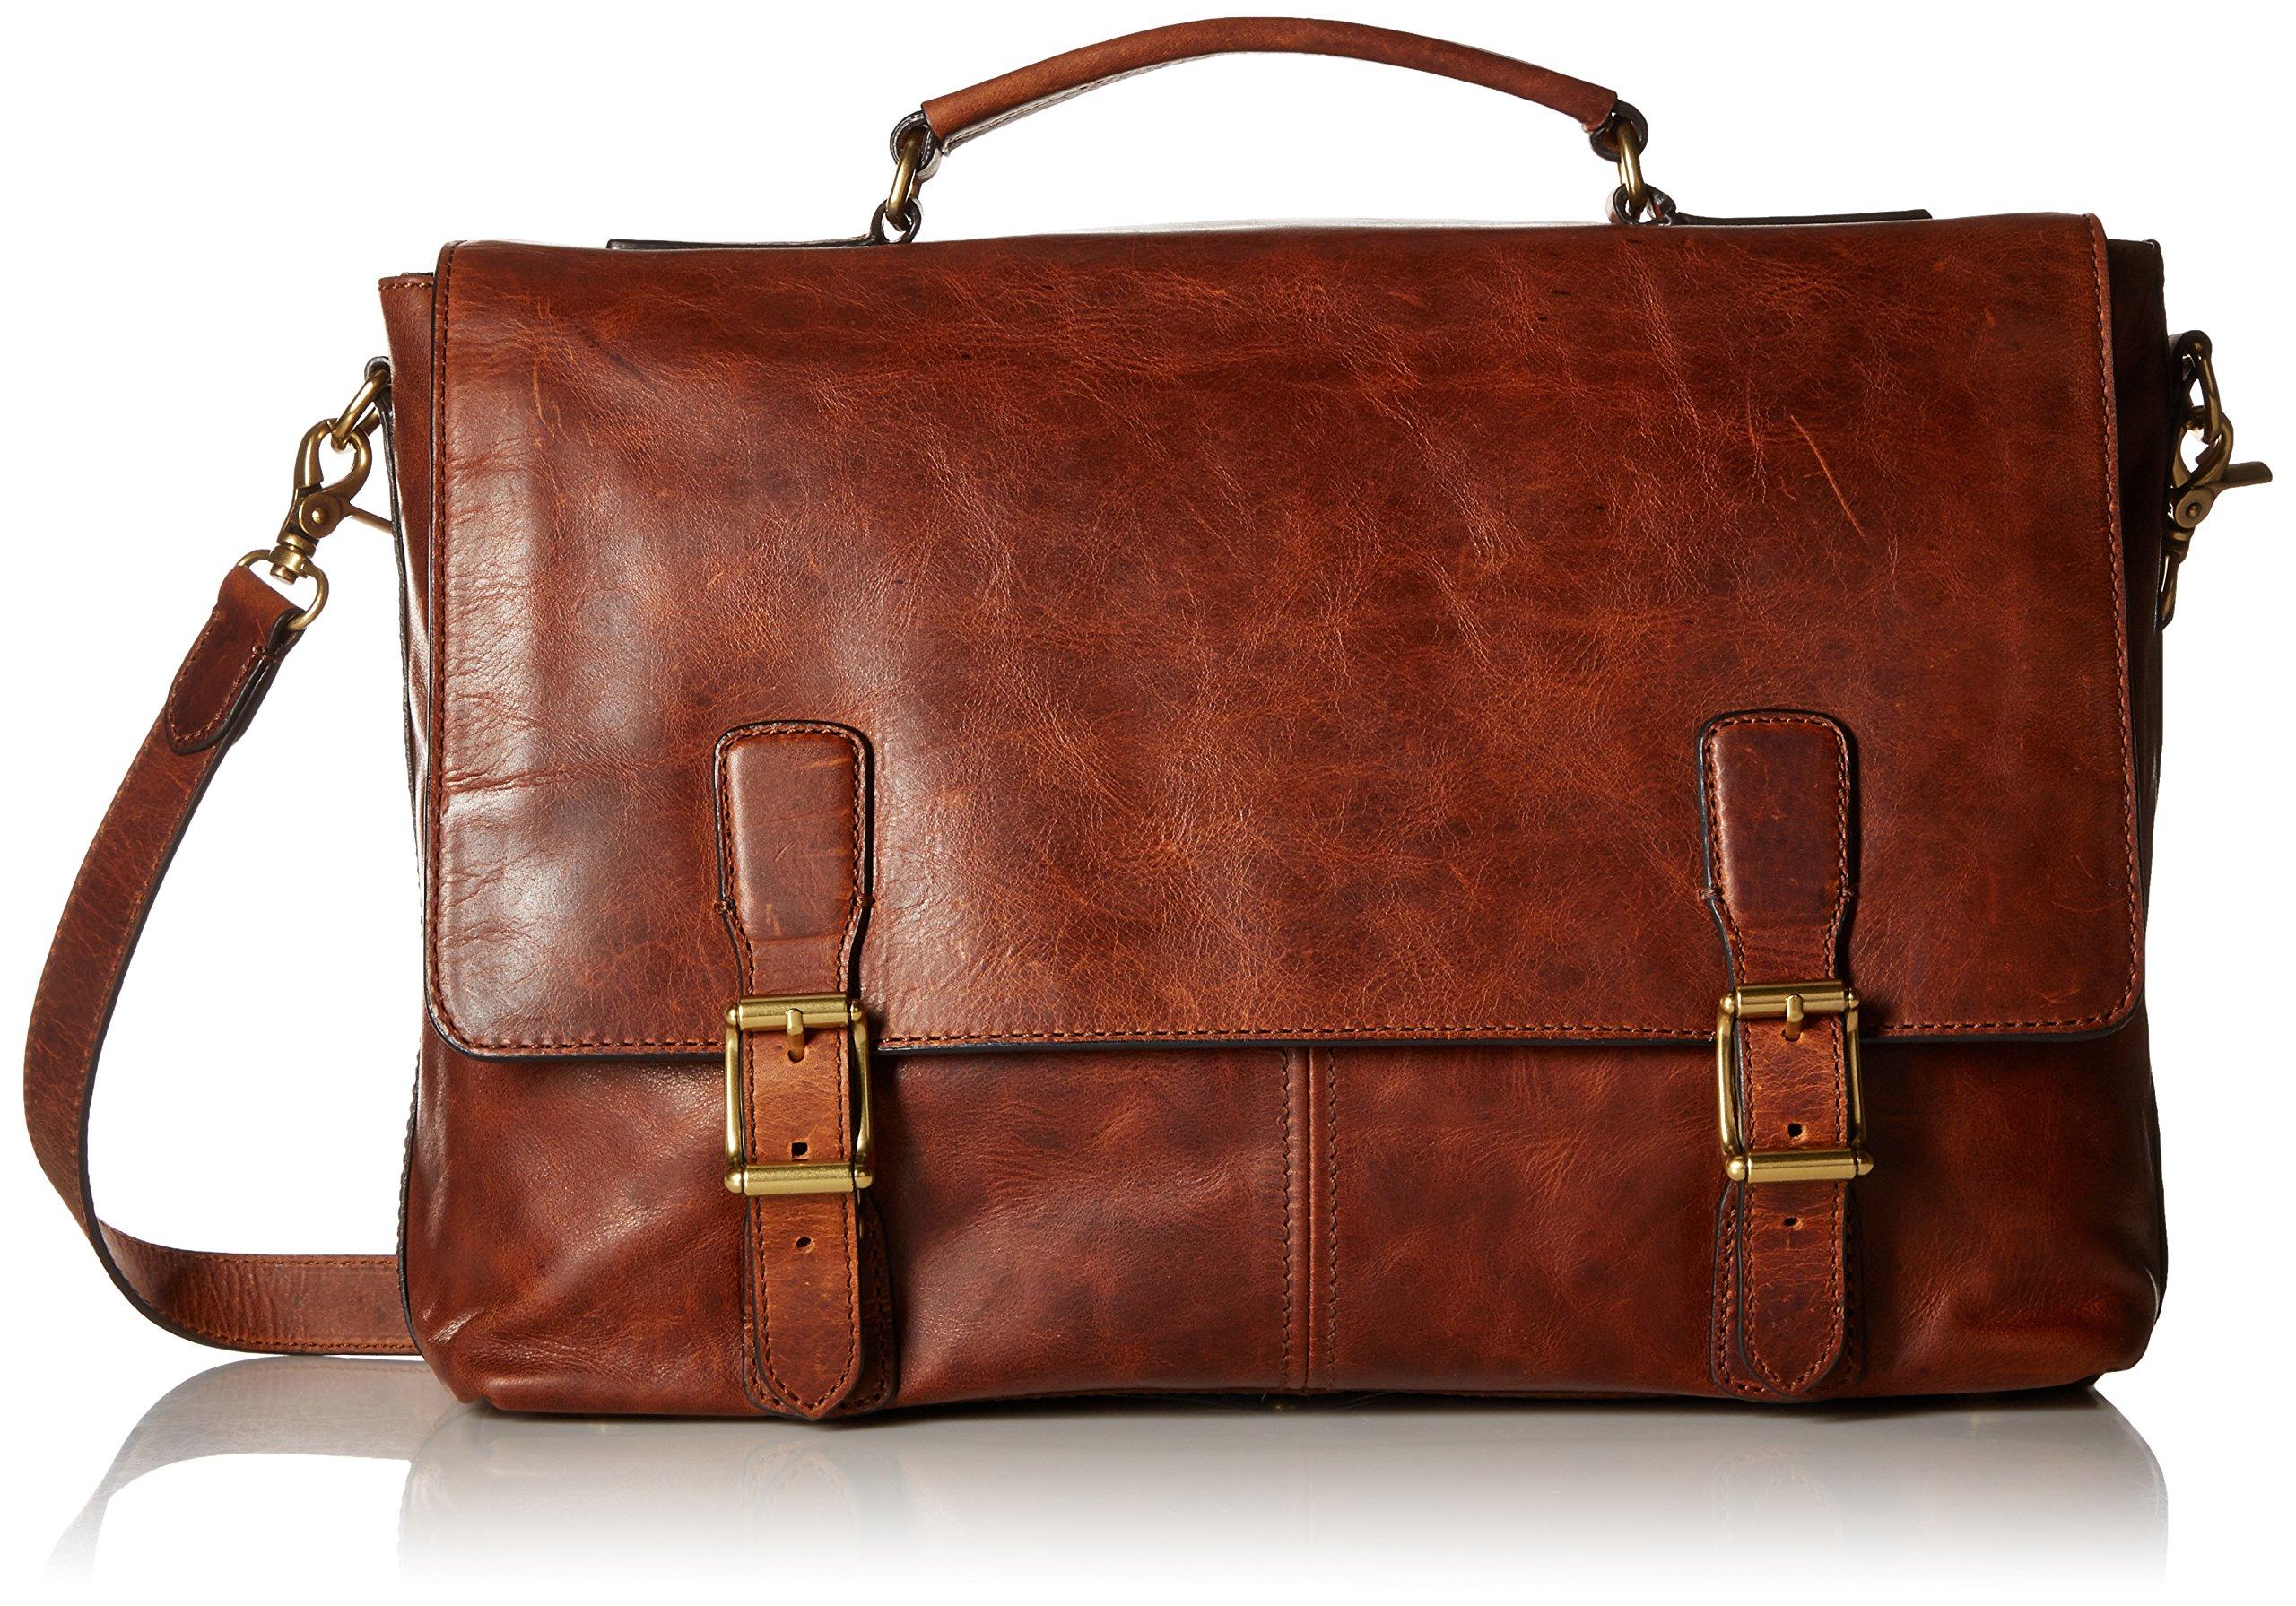 FRYE Men's Logan Top Handle Messenger Bag, Cognac, One Size,Standard